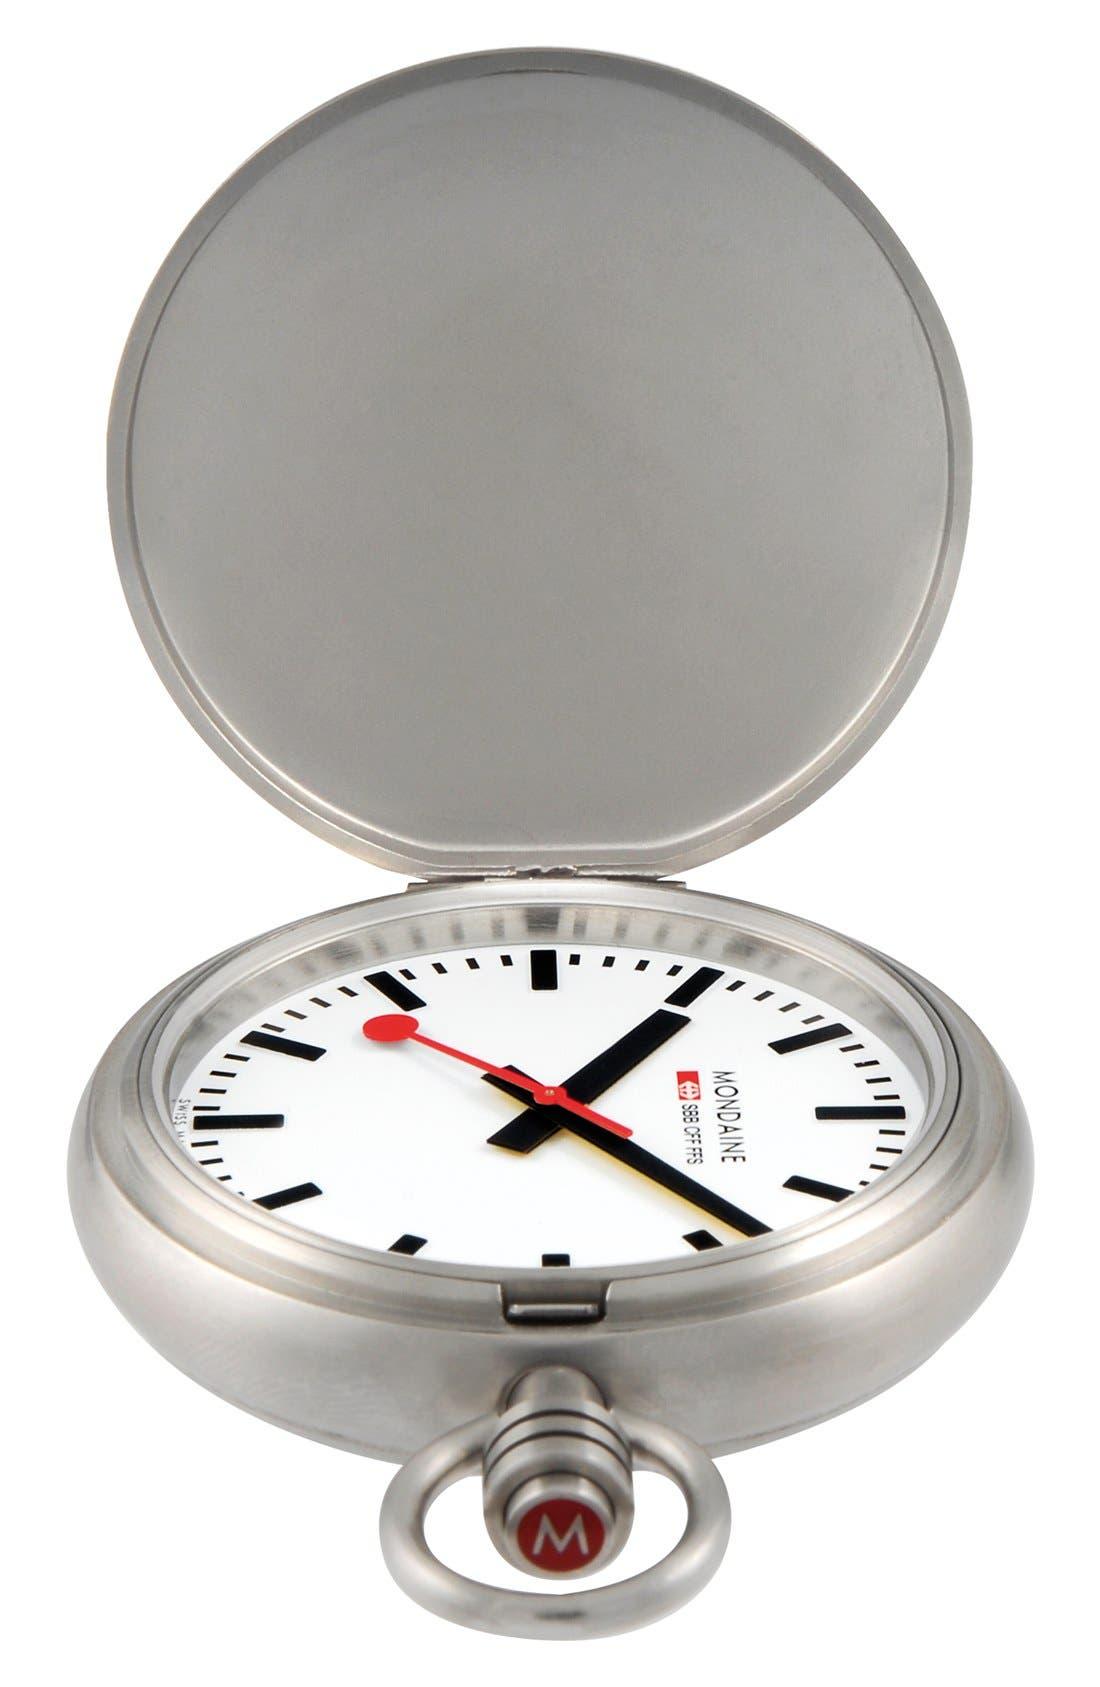 Alternate Image 1 Selected - Mondaine 'Savonnette II' Pocket Watch, 51mm